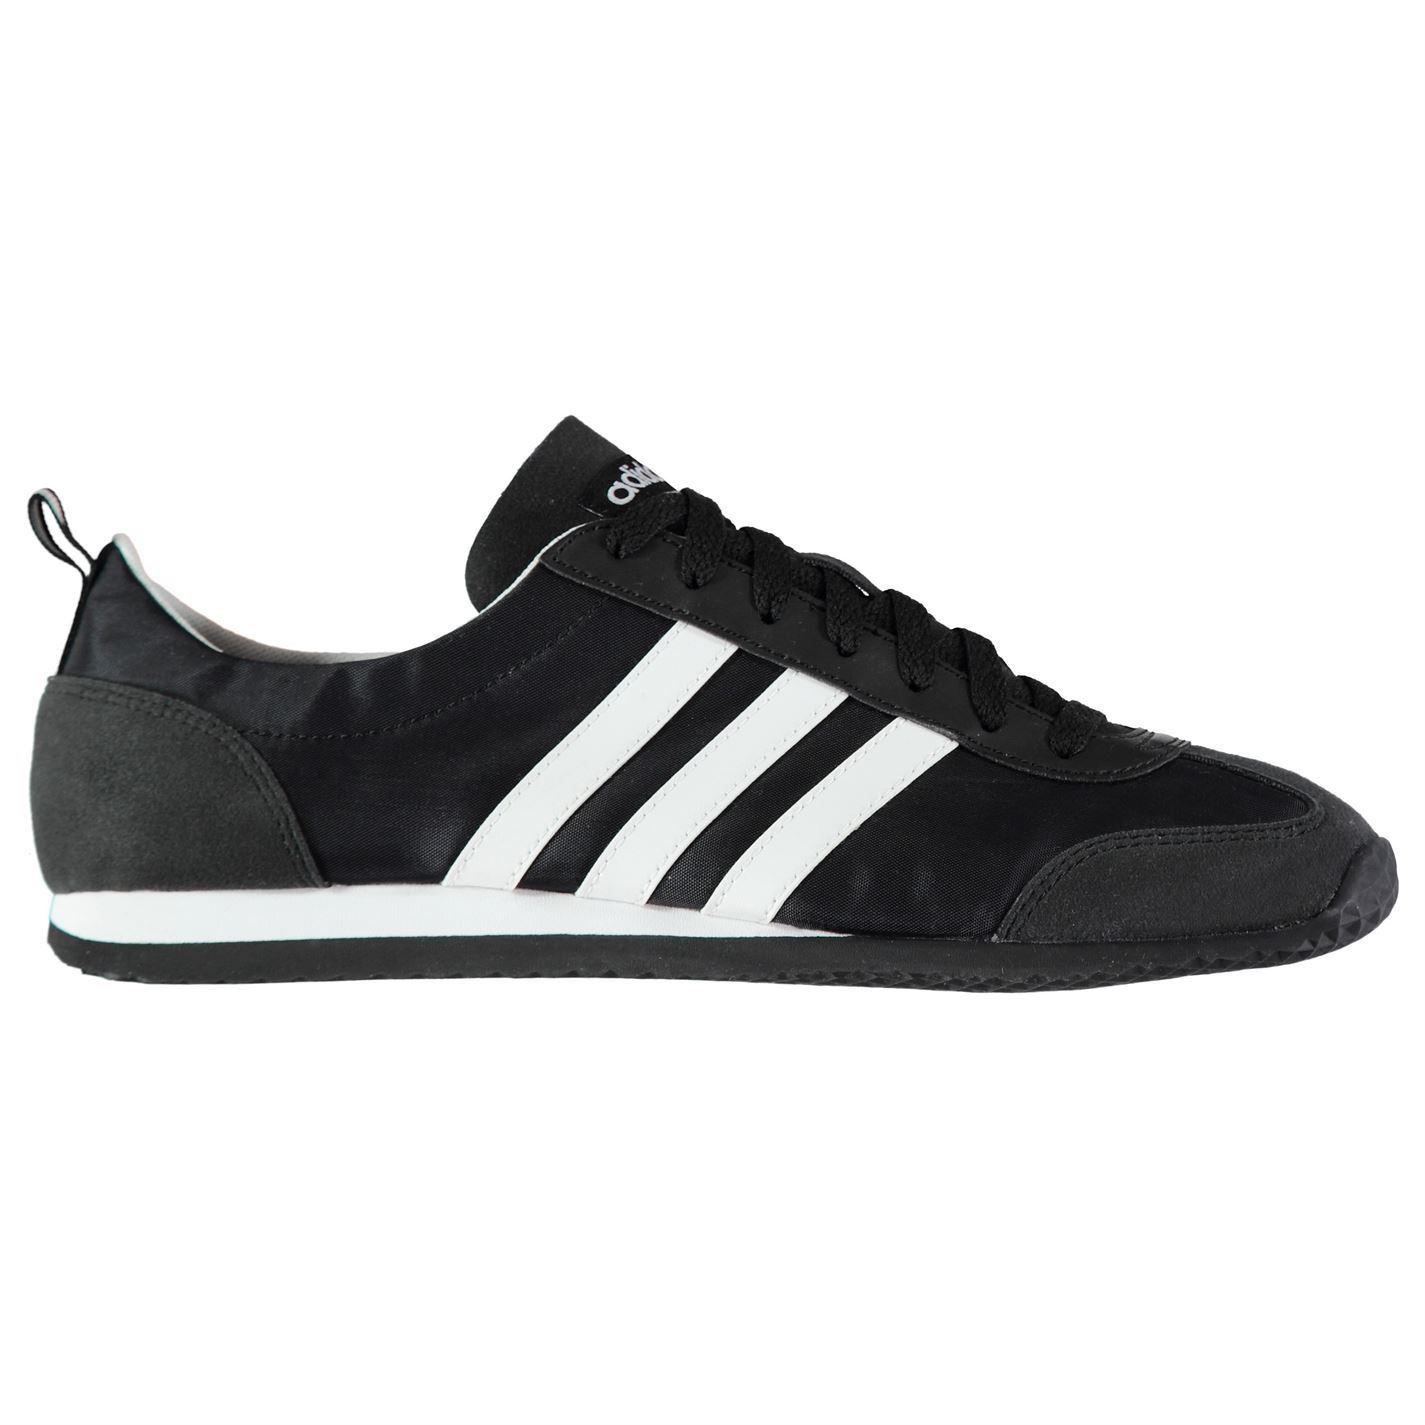 Adidas Vs Jog Shoes Nylon